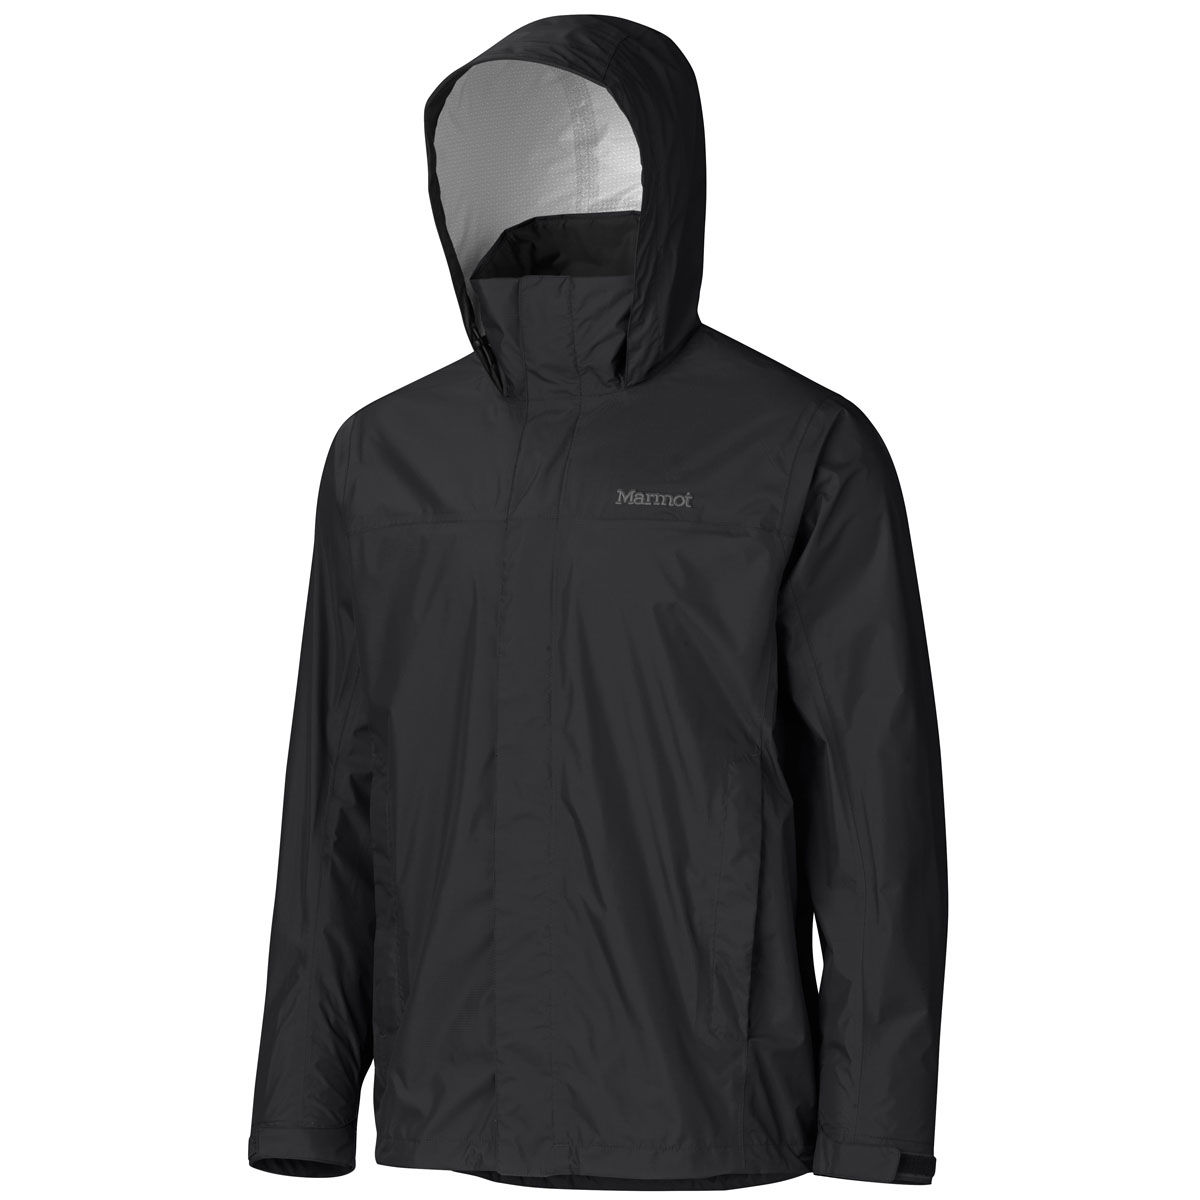 Marmot Men's Precip Jacket - Black, M